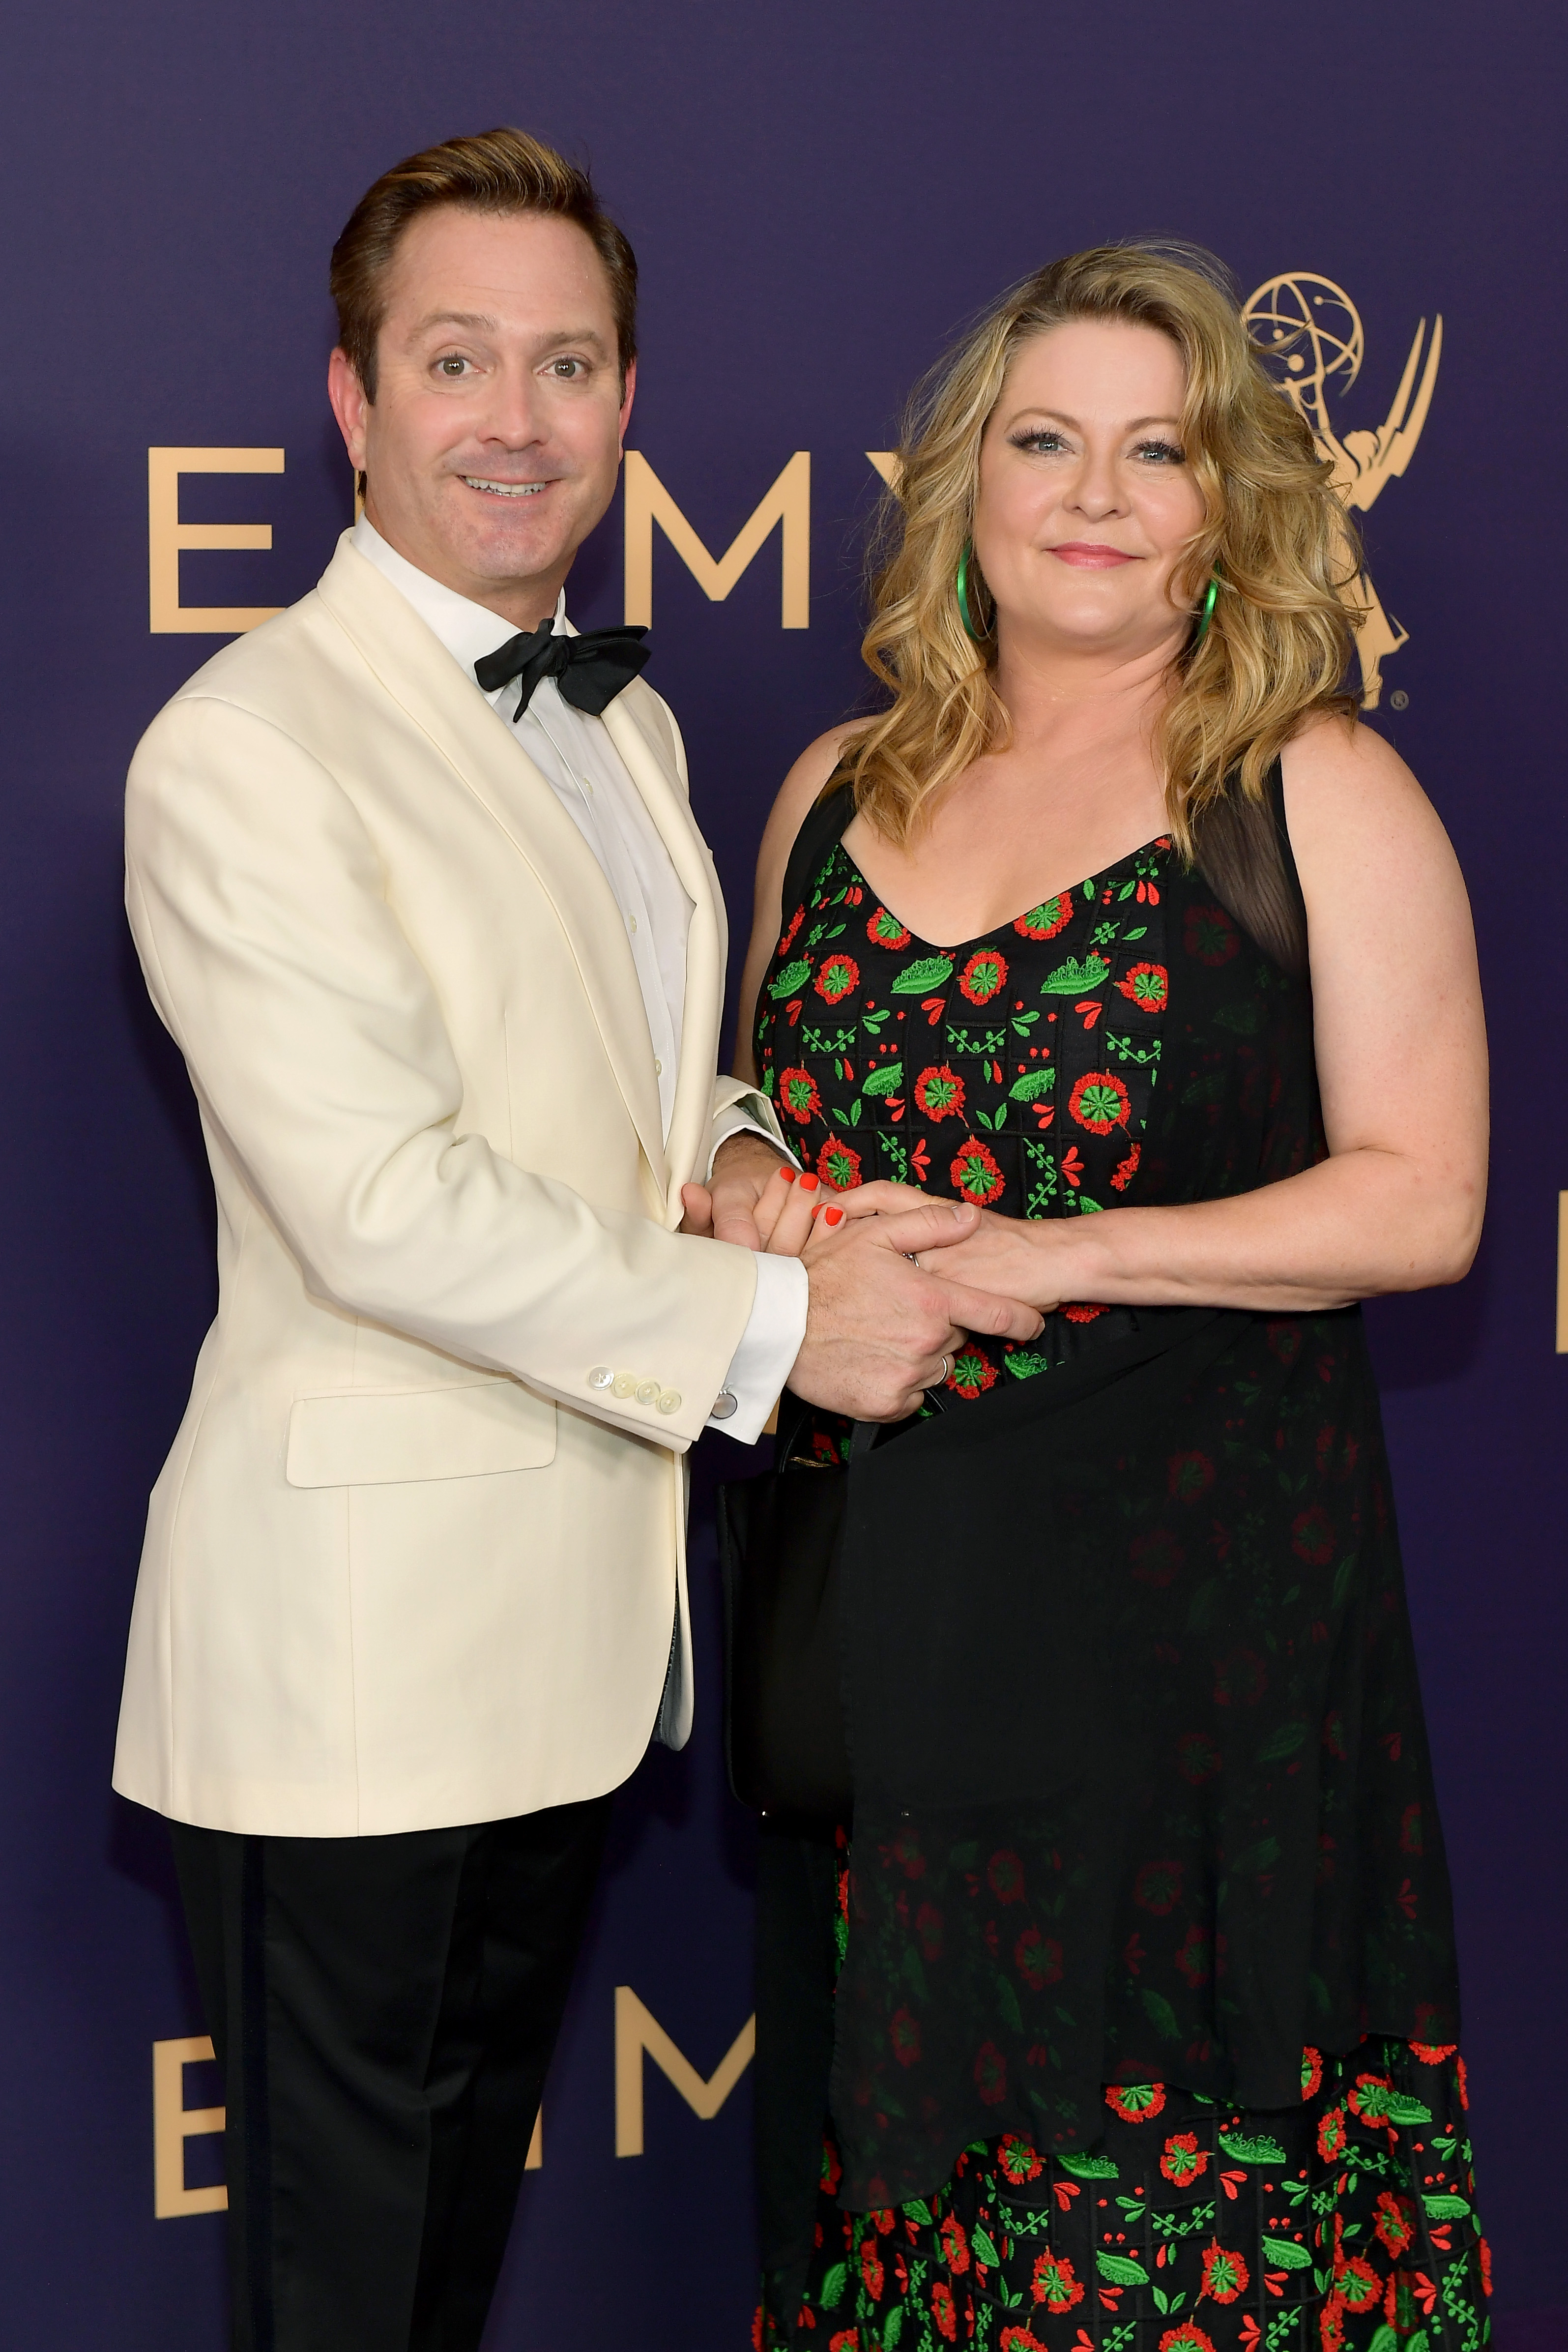 Thomas Lennon and Jenny Robertson attend the 71st Emmy Awardsvin Los Angeles, California.